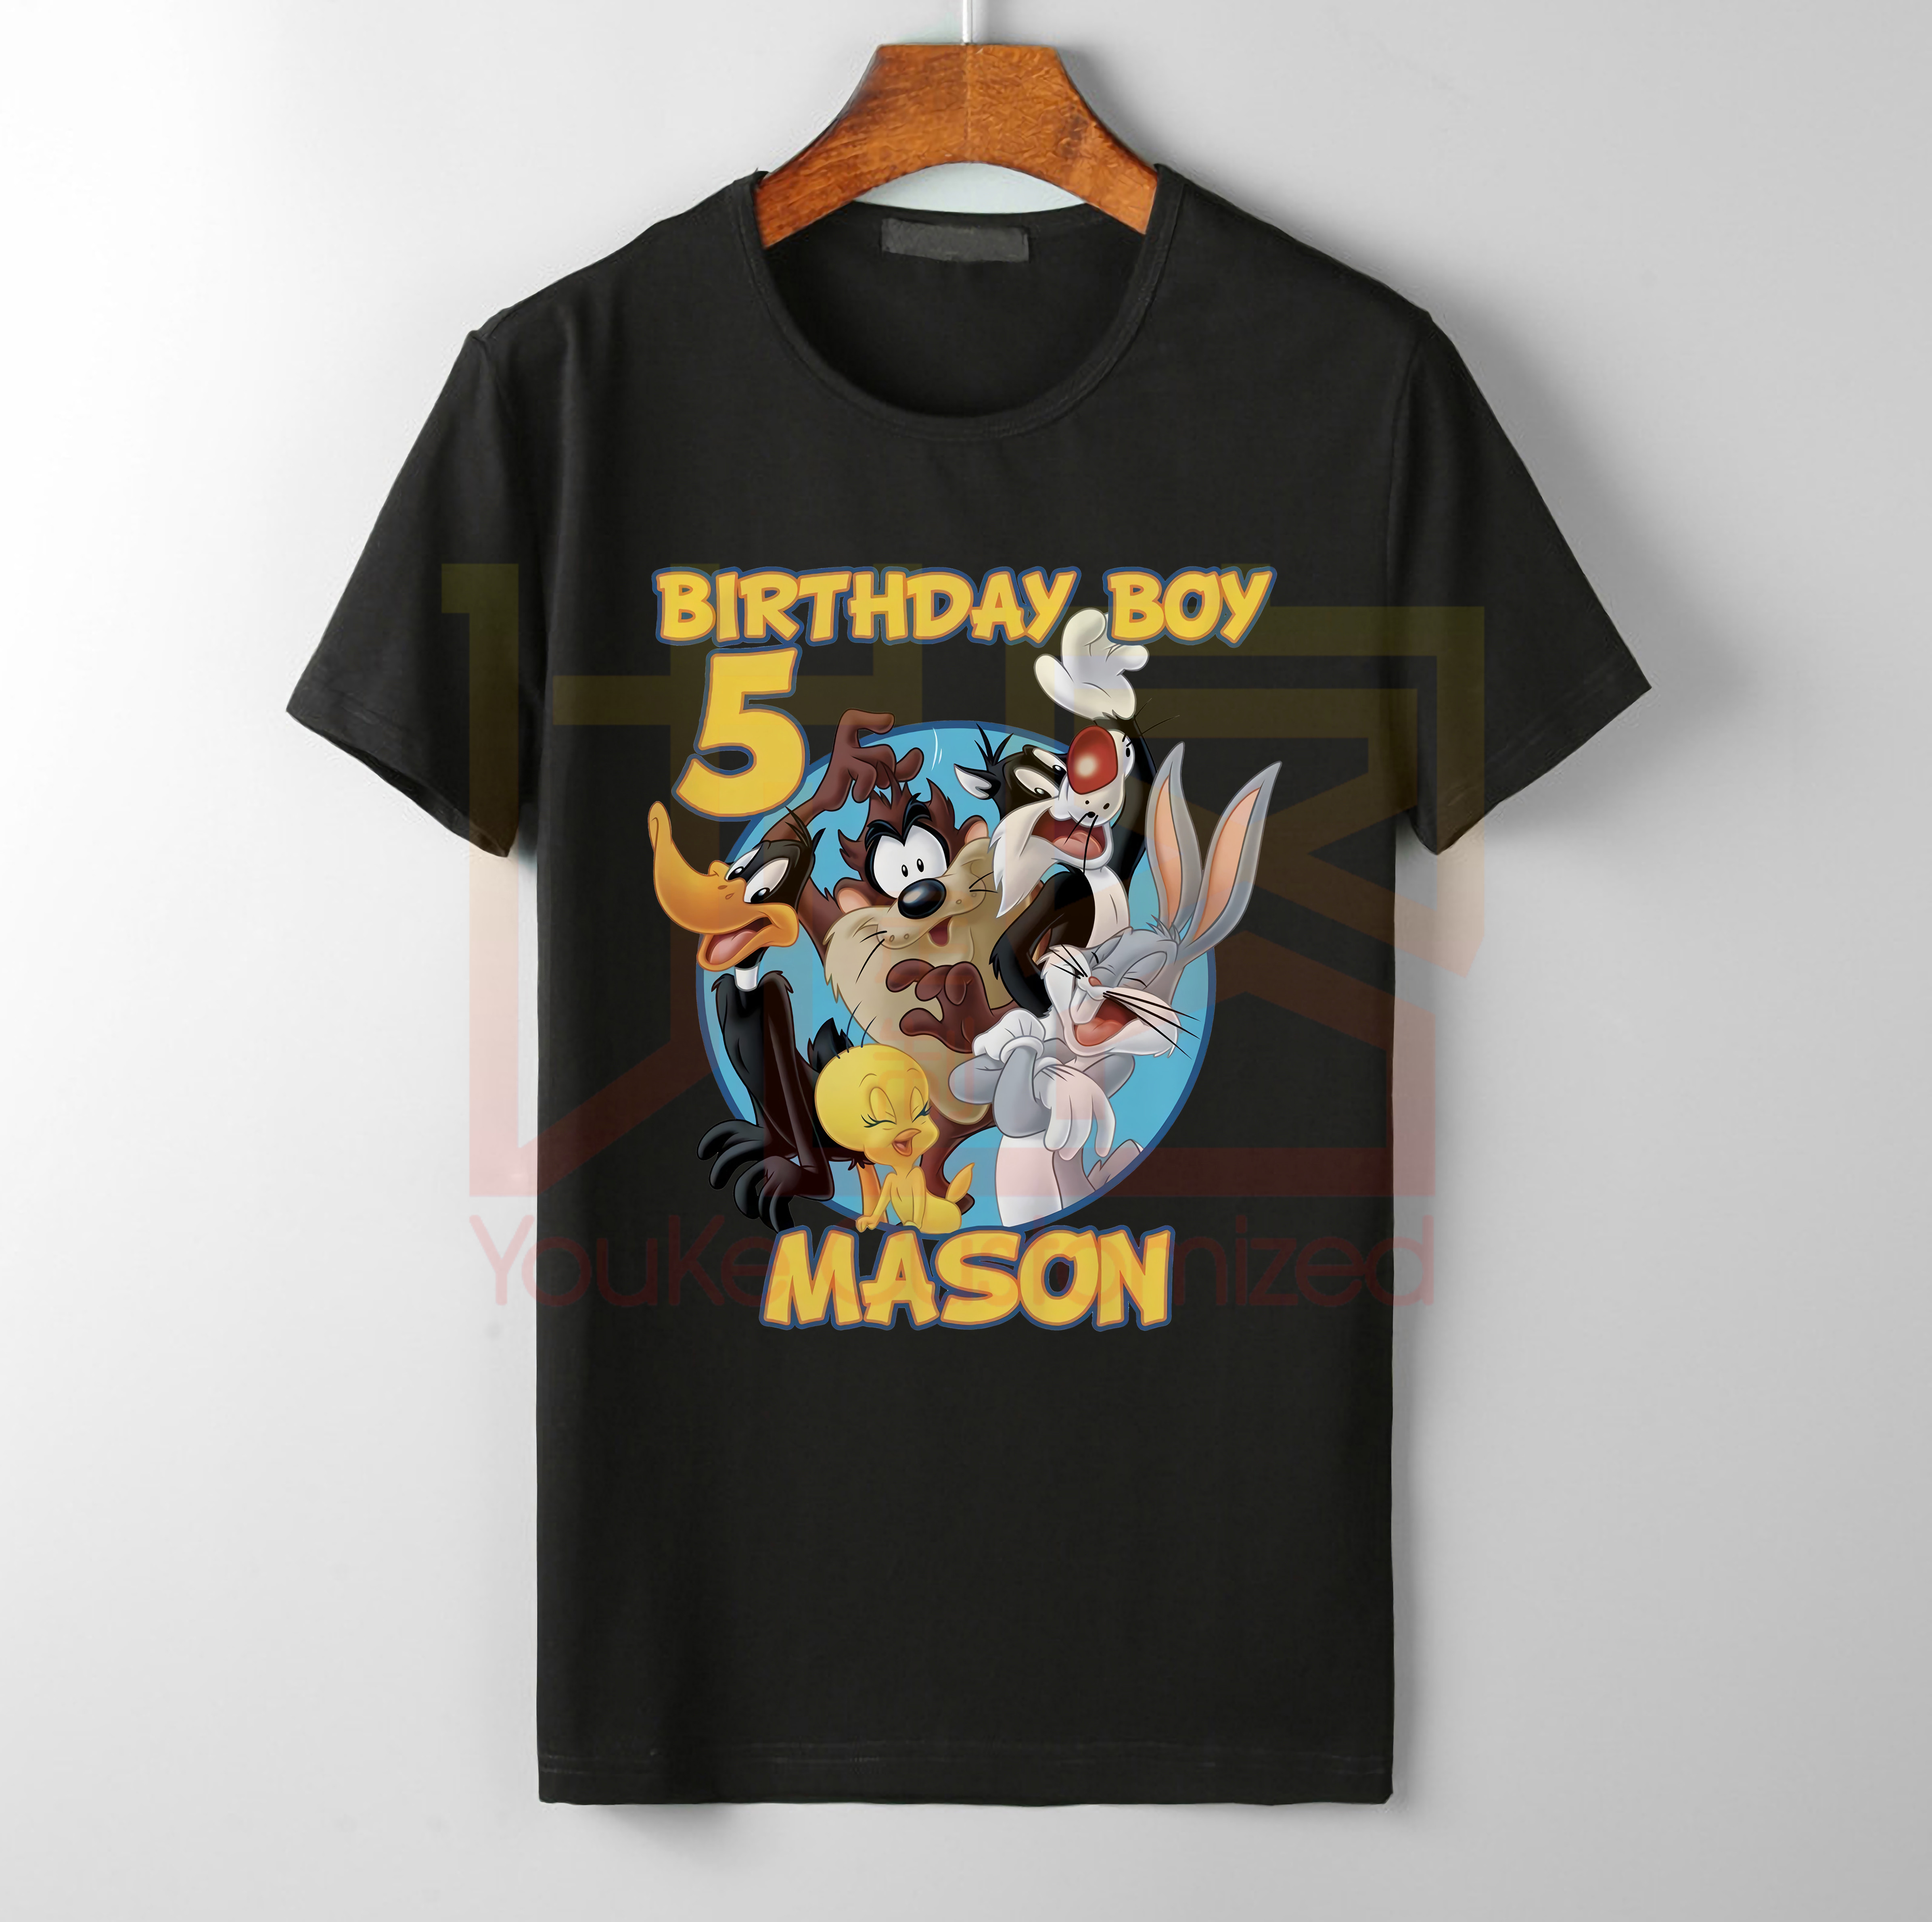 Funny 3D T-shirt Lola Bugs Bunny Spank Looney Tunes Cartoon Men Women